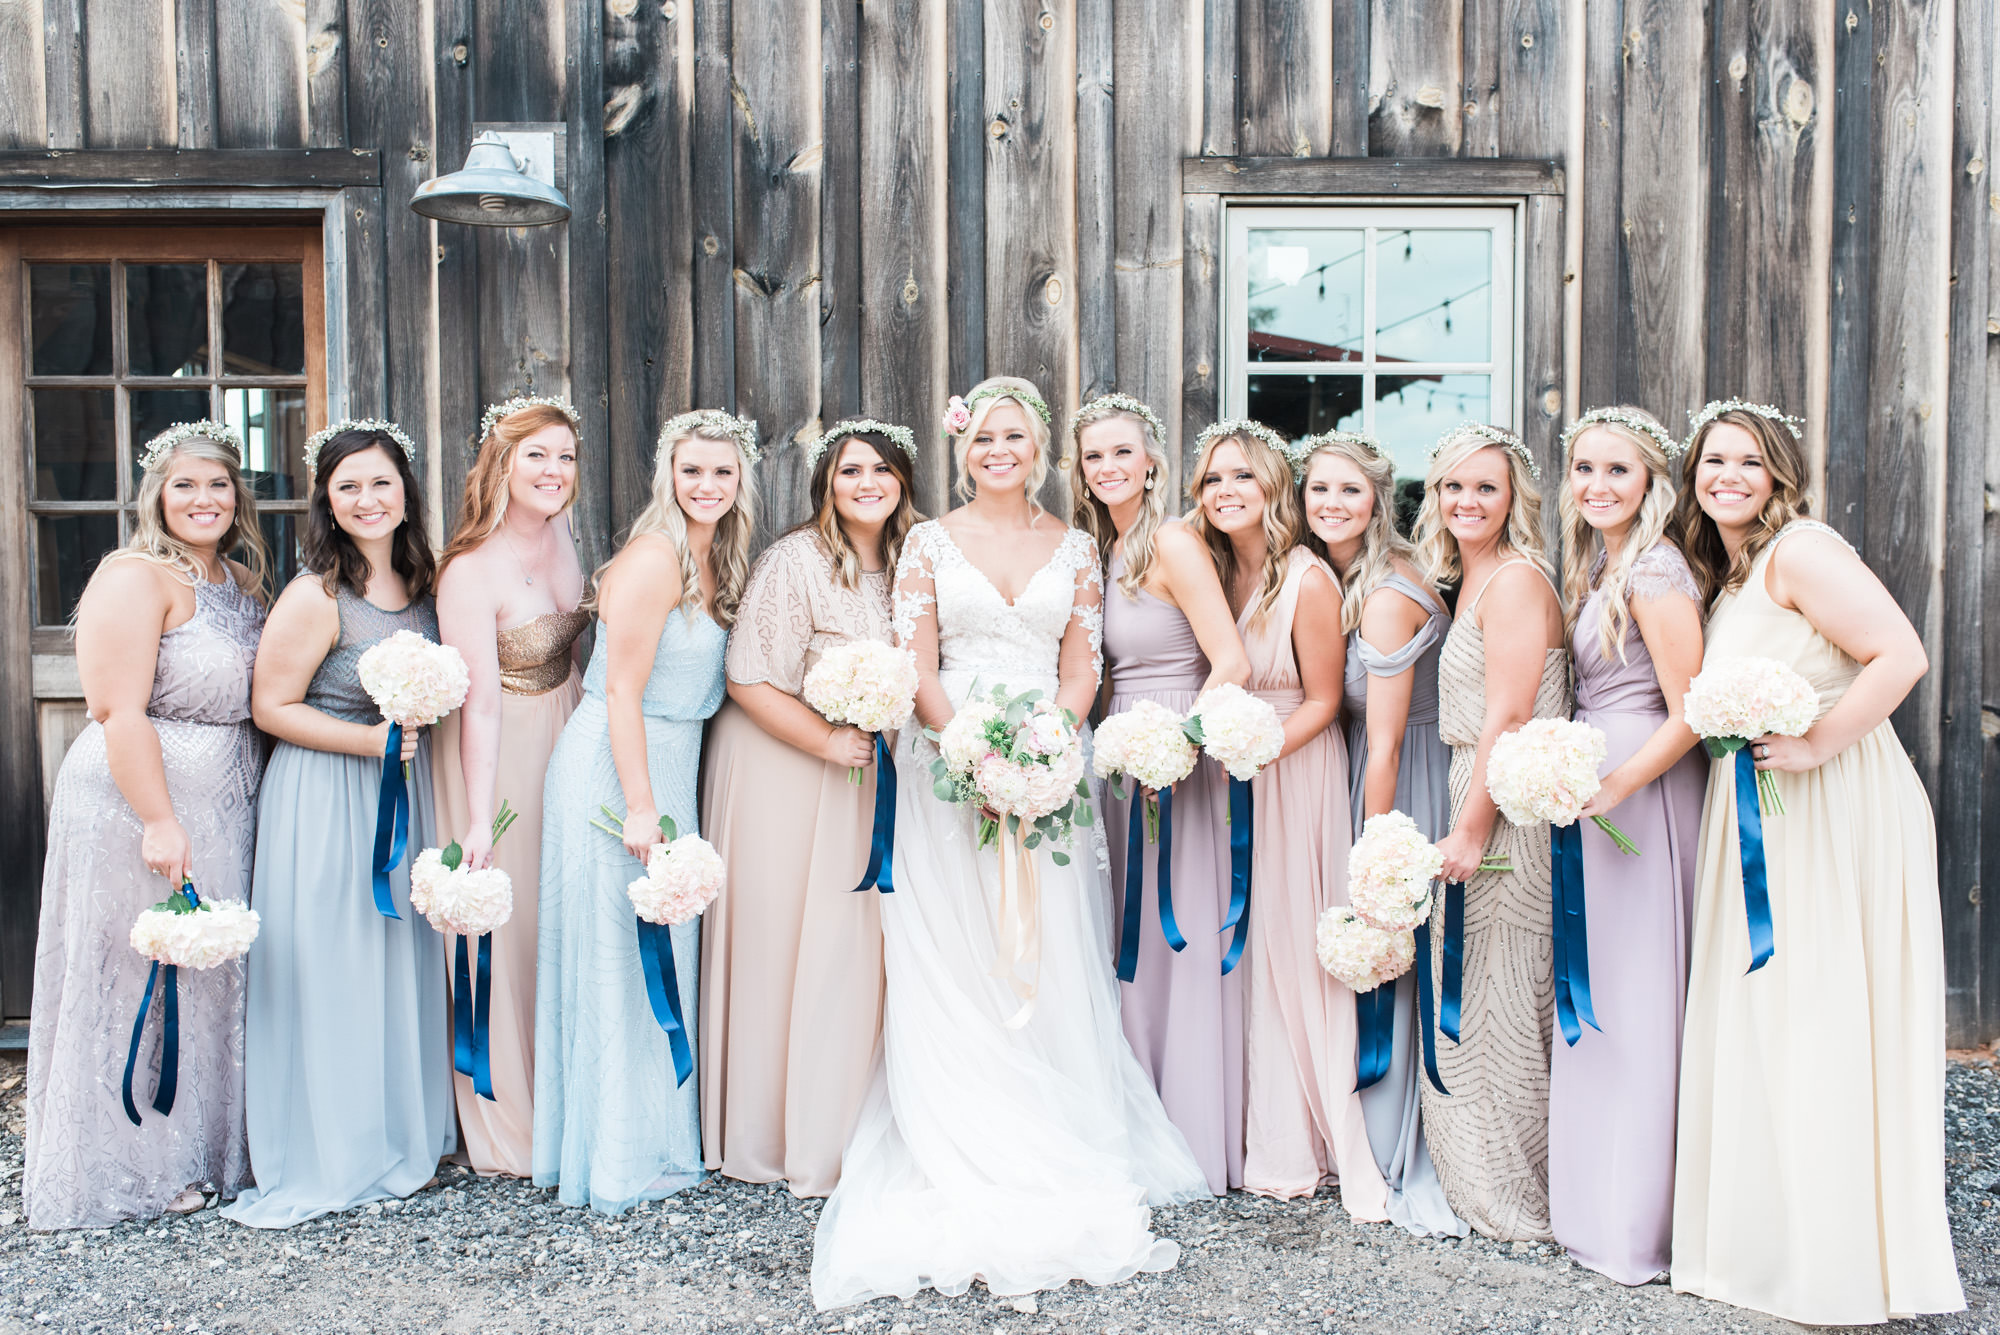 georgia-wedding-bridesmaids-photography-25.jpg